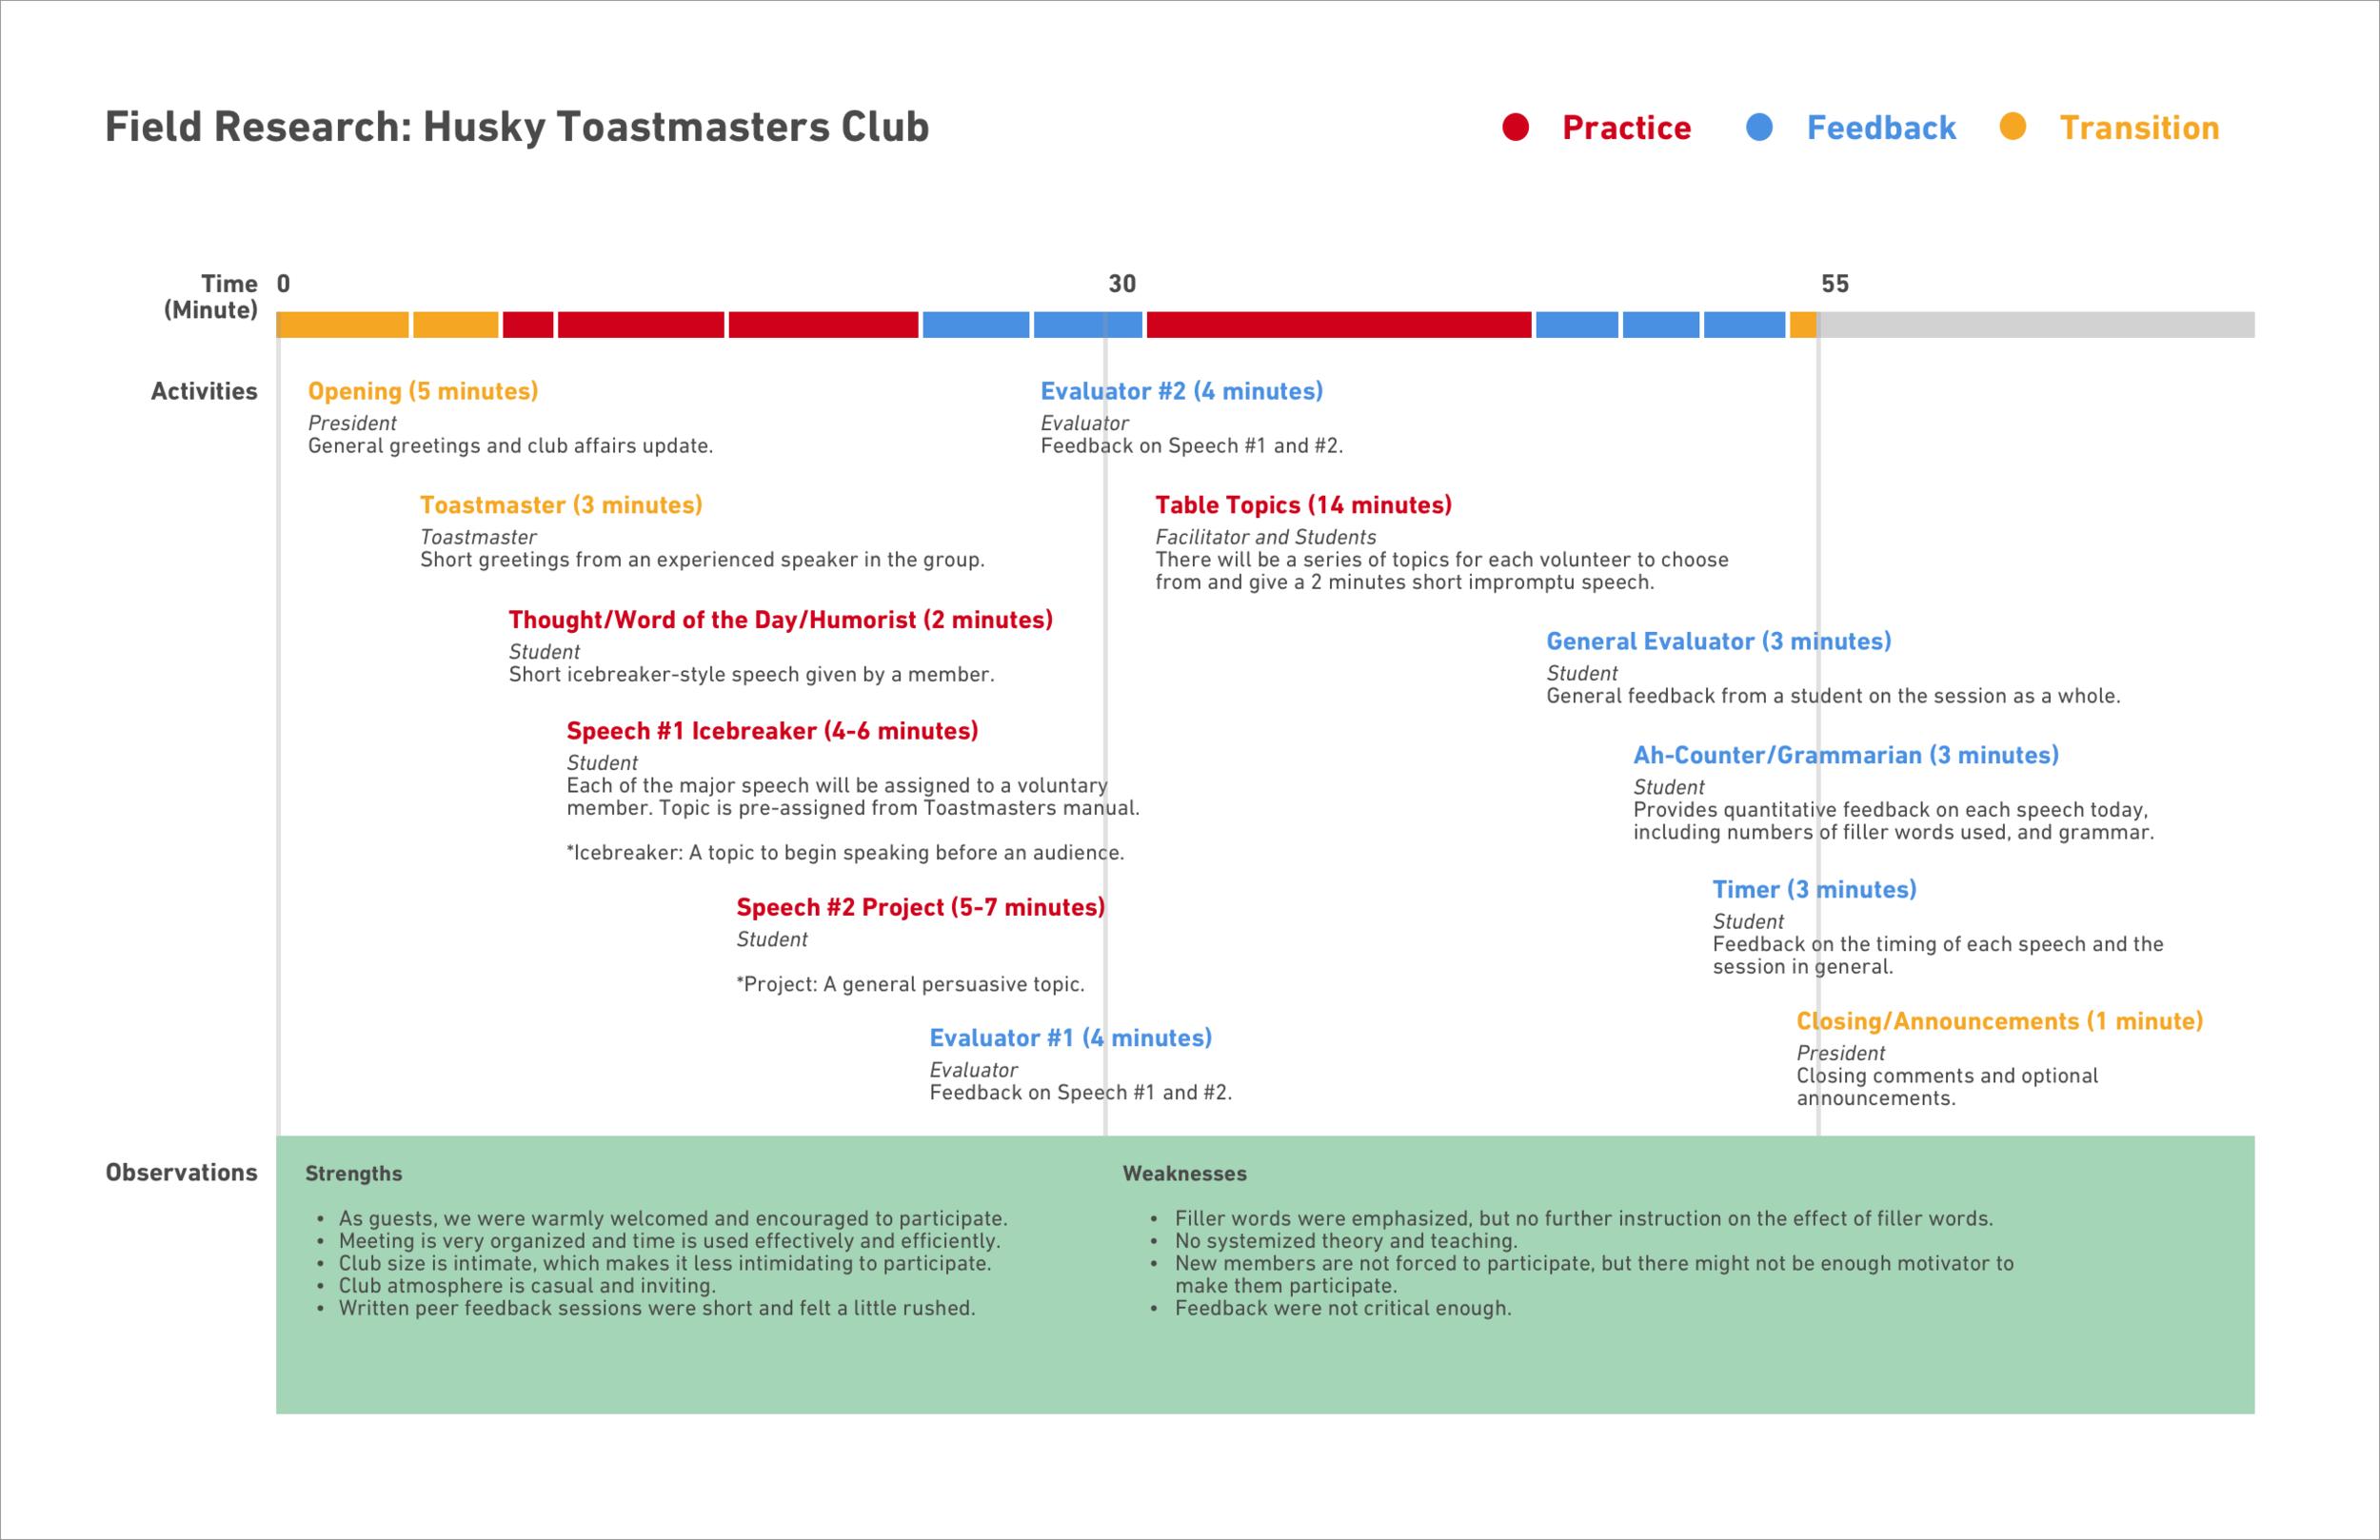 Field Study Report: Husky Toastmasters